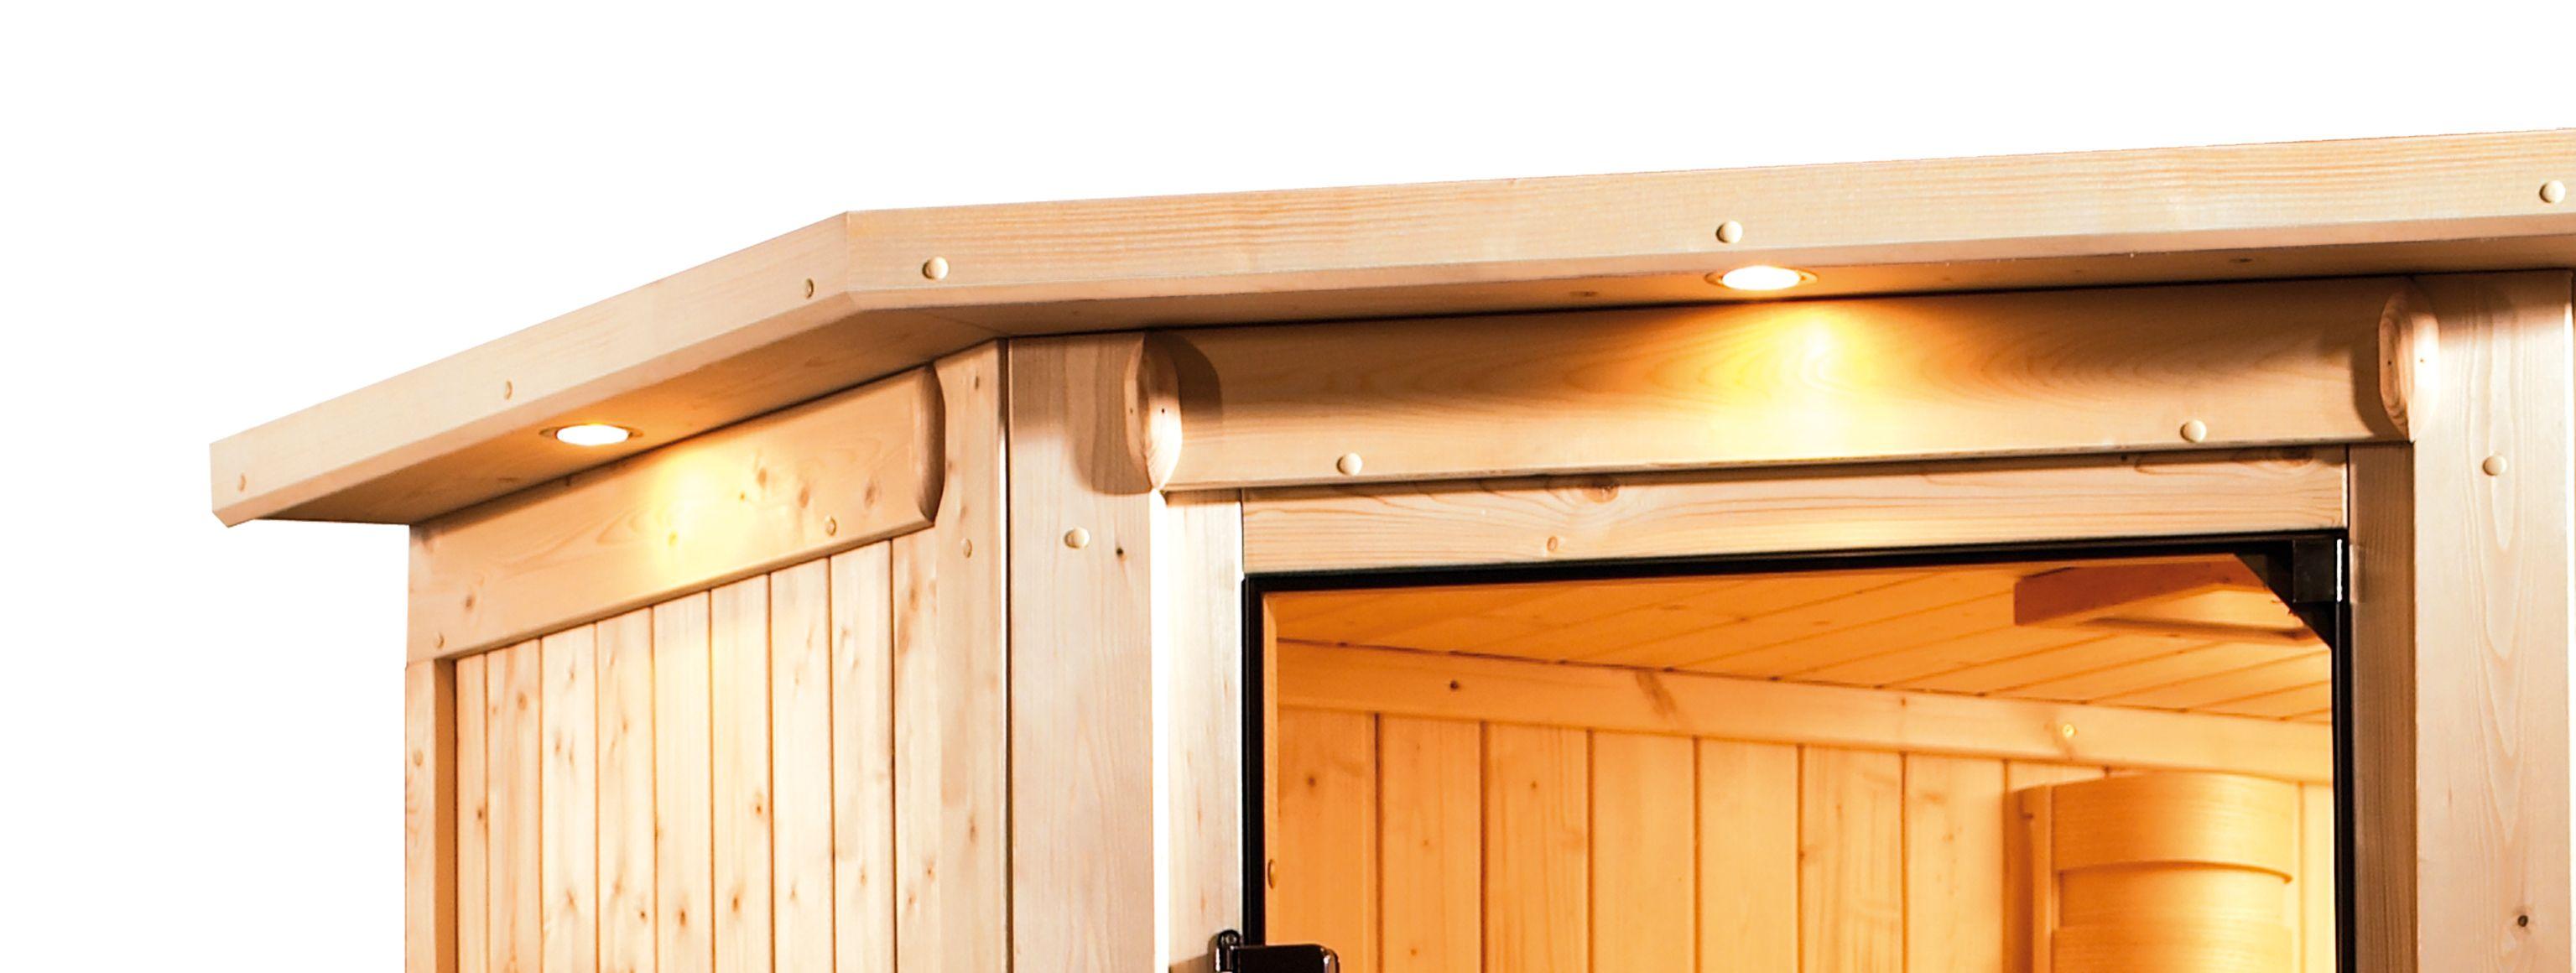 Woodfeeling Sauna Antonia 38mm Dachkranz Saunaofen 9 kW extern Bild 7